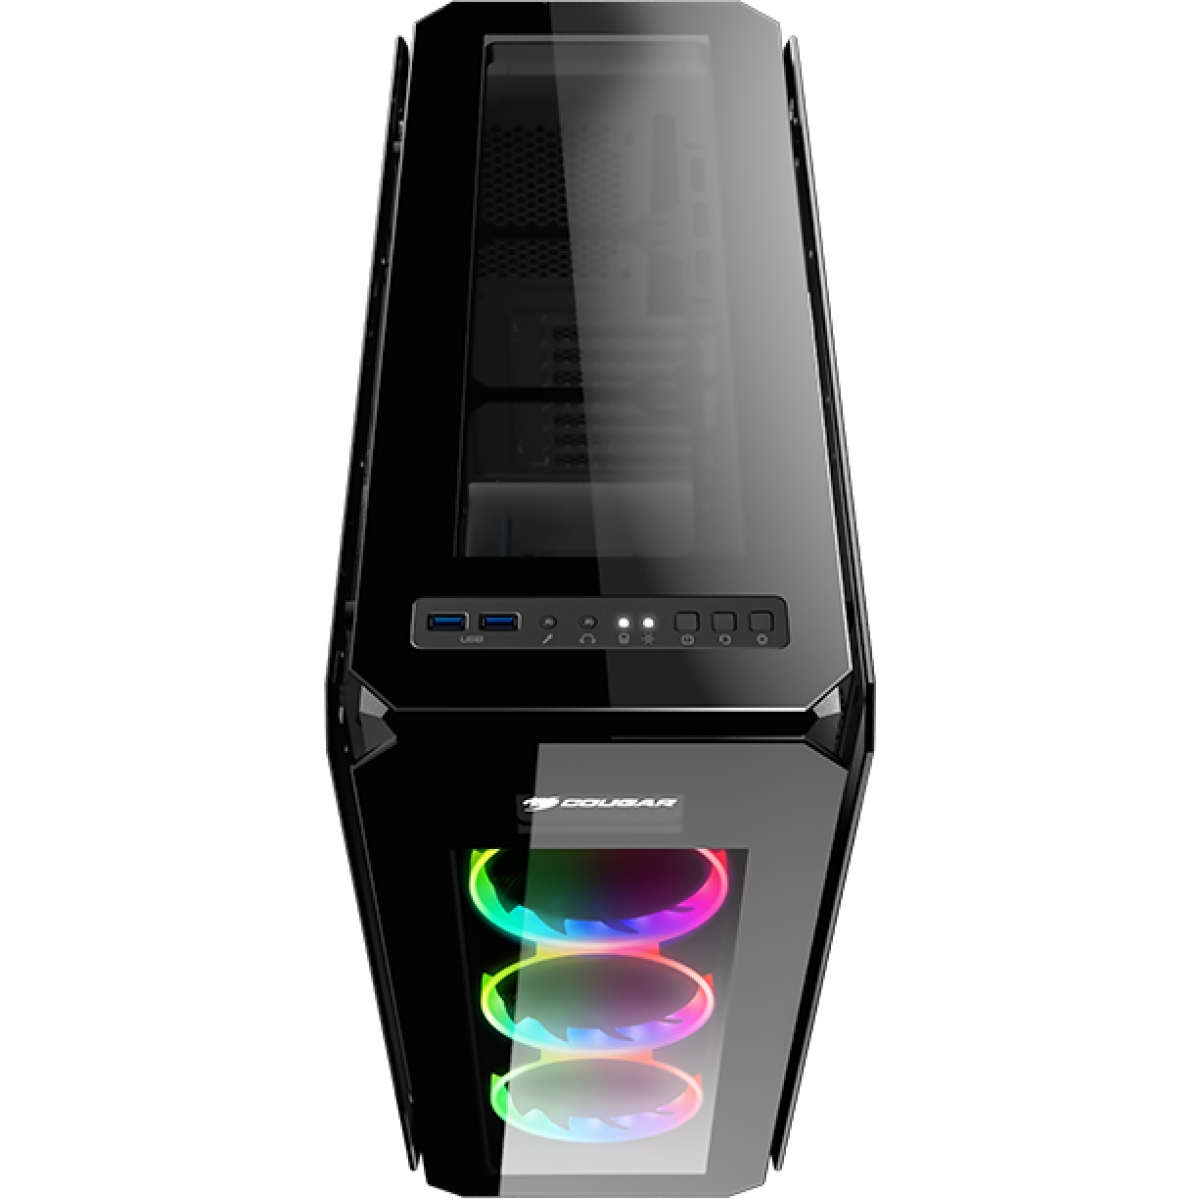 Gabinete Gamer Cougar Puritas RGB, Mid Tower, Com 3 Fans, Vidro Temperado, Black, Sem Fonte